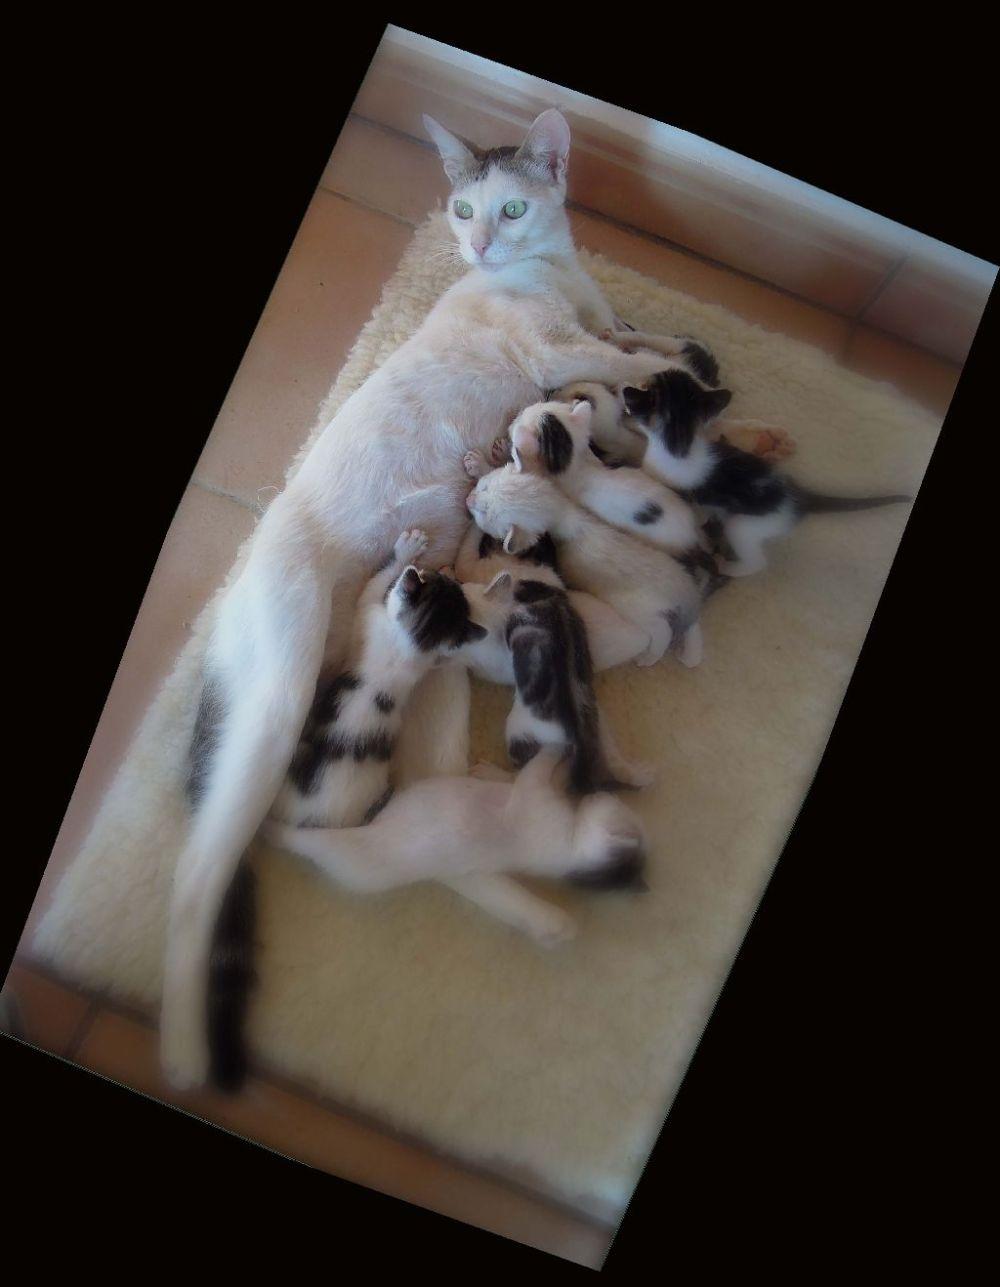 Lactation-Rola & 9 Baby Kittens